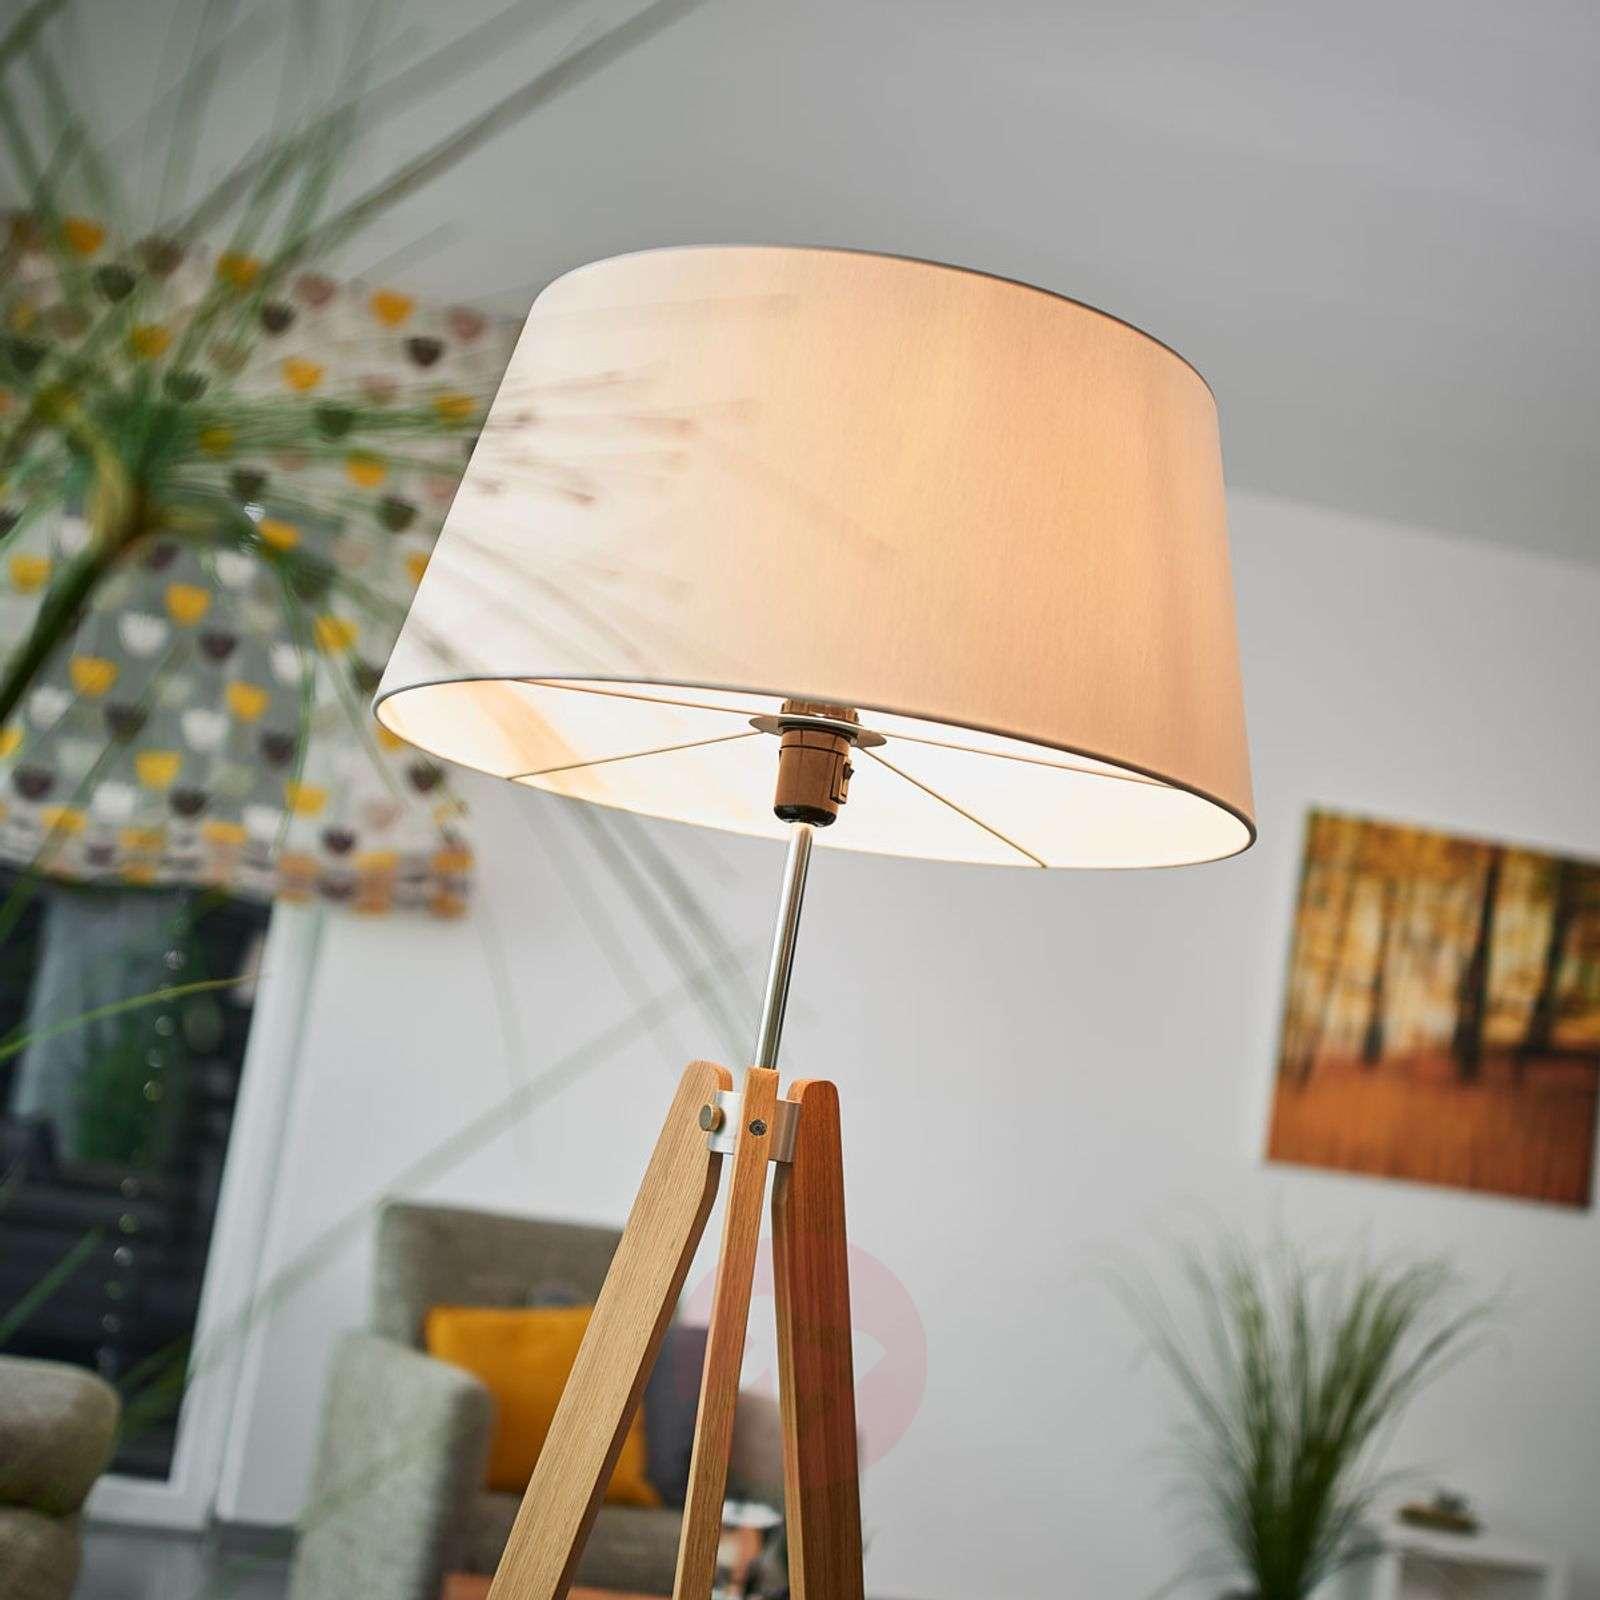 Textile floor lamp Thea with an oak frame-6722431-01